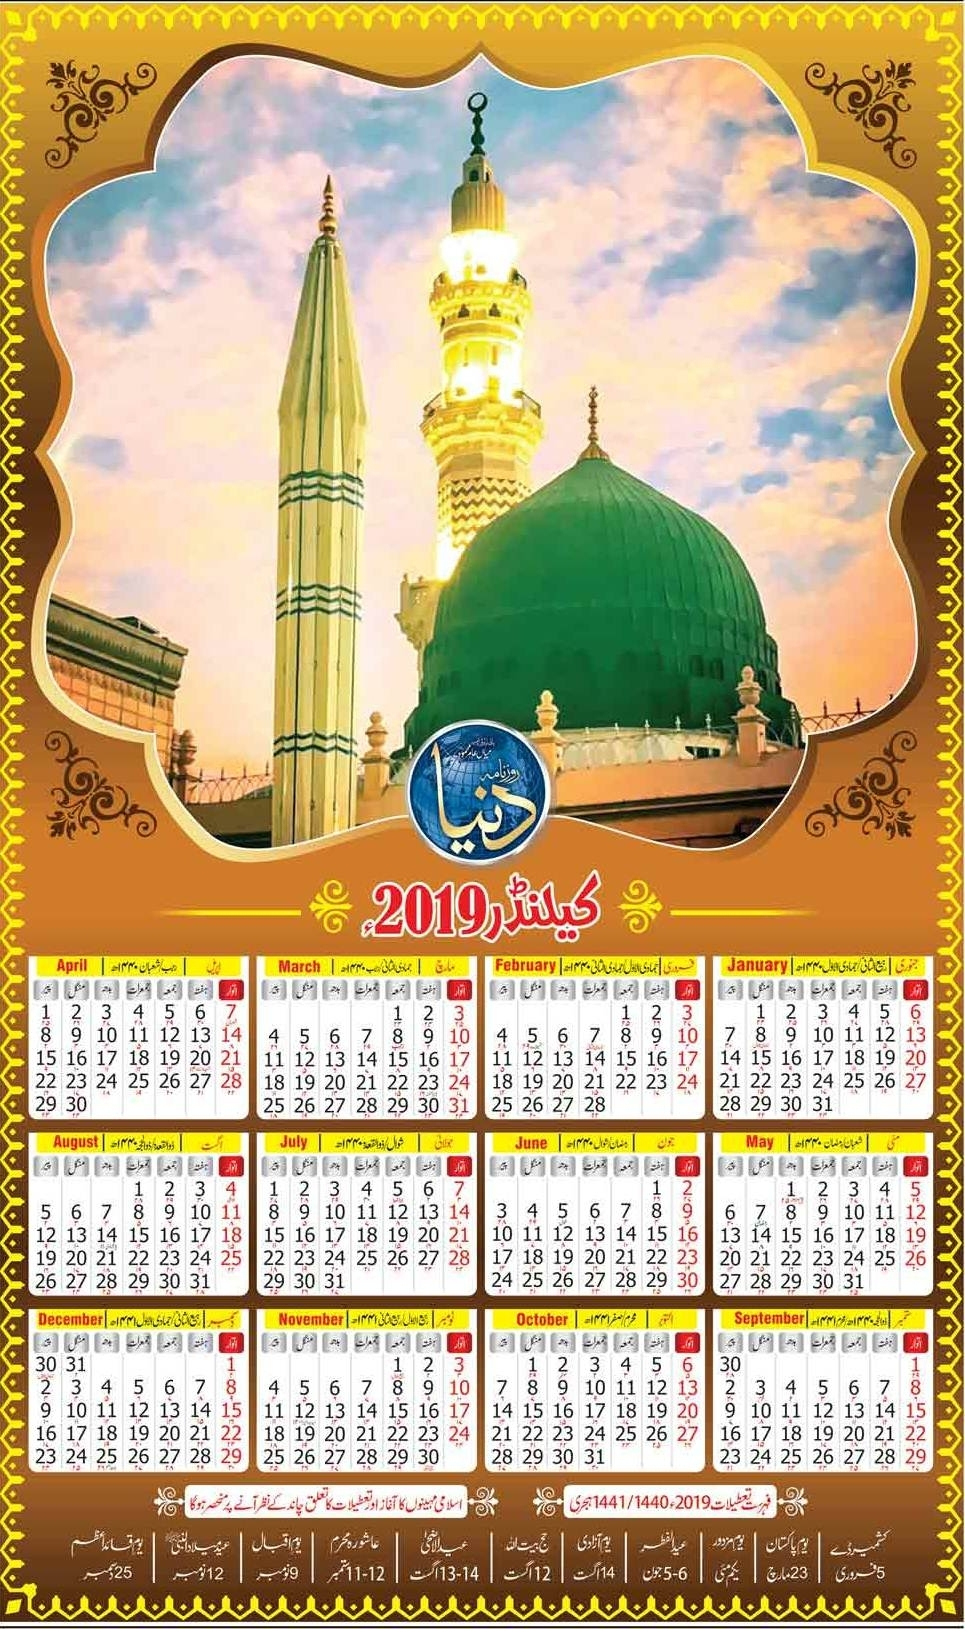 Islamic Calendar Today  Google Search with Zil Hajj Date